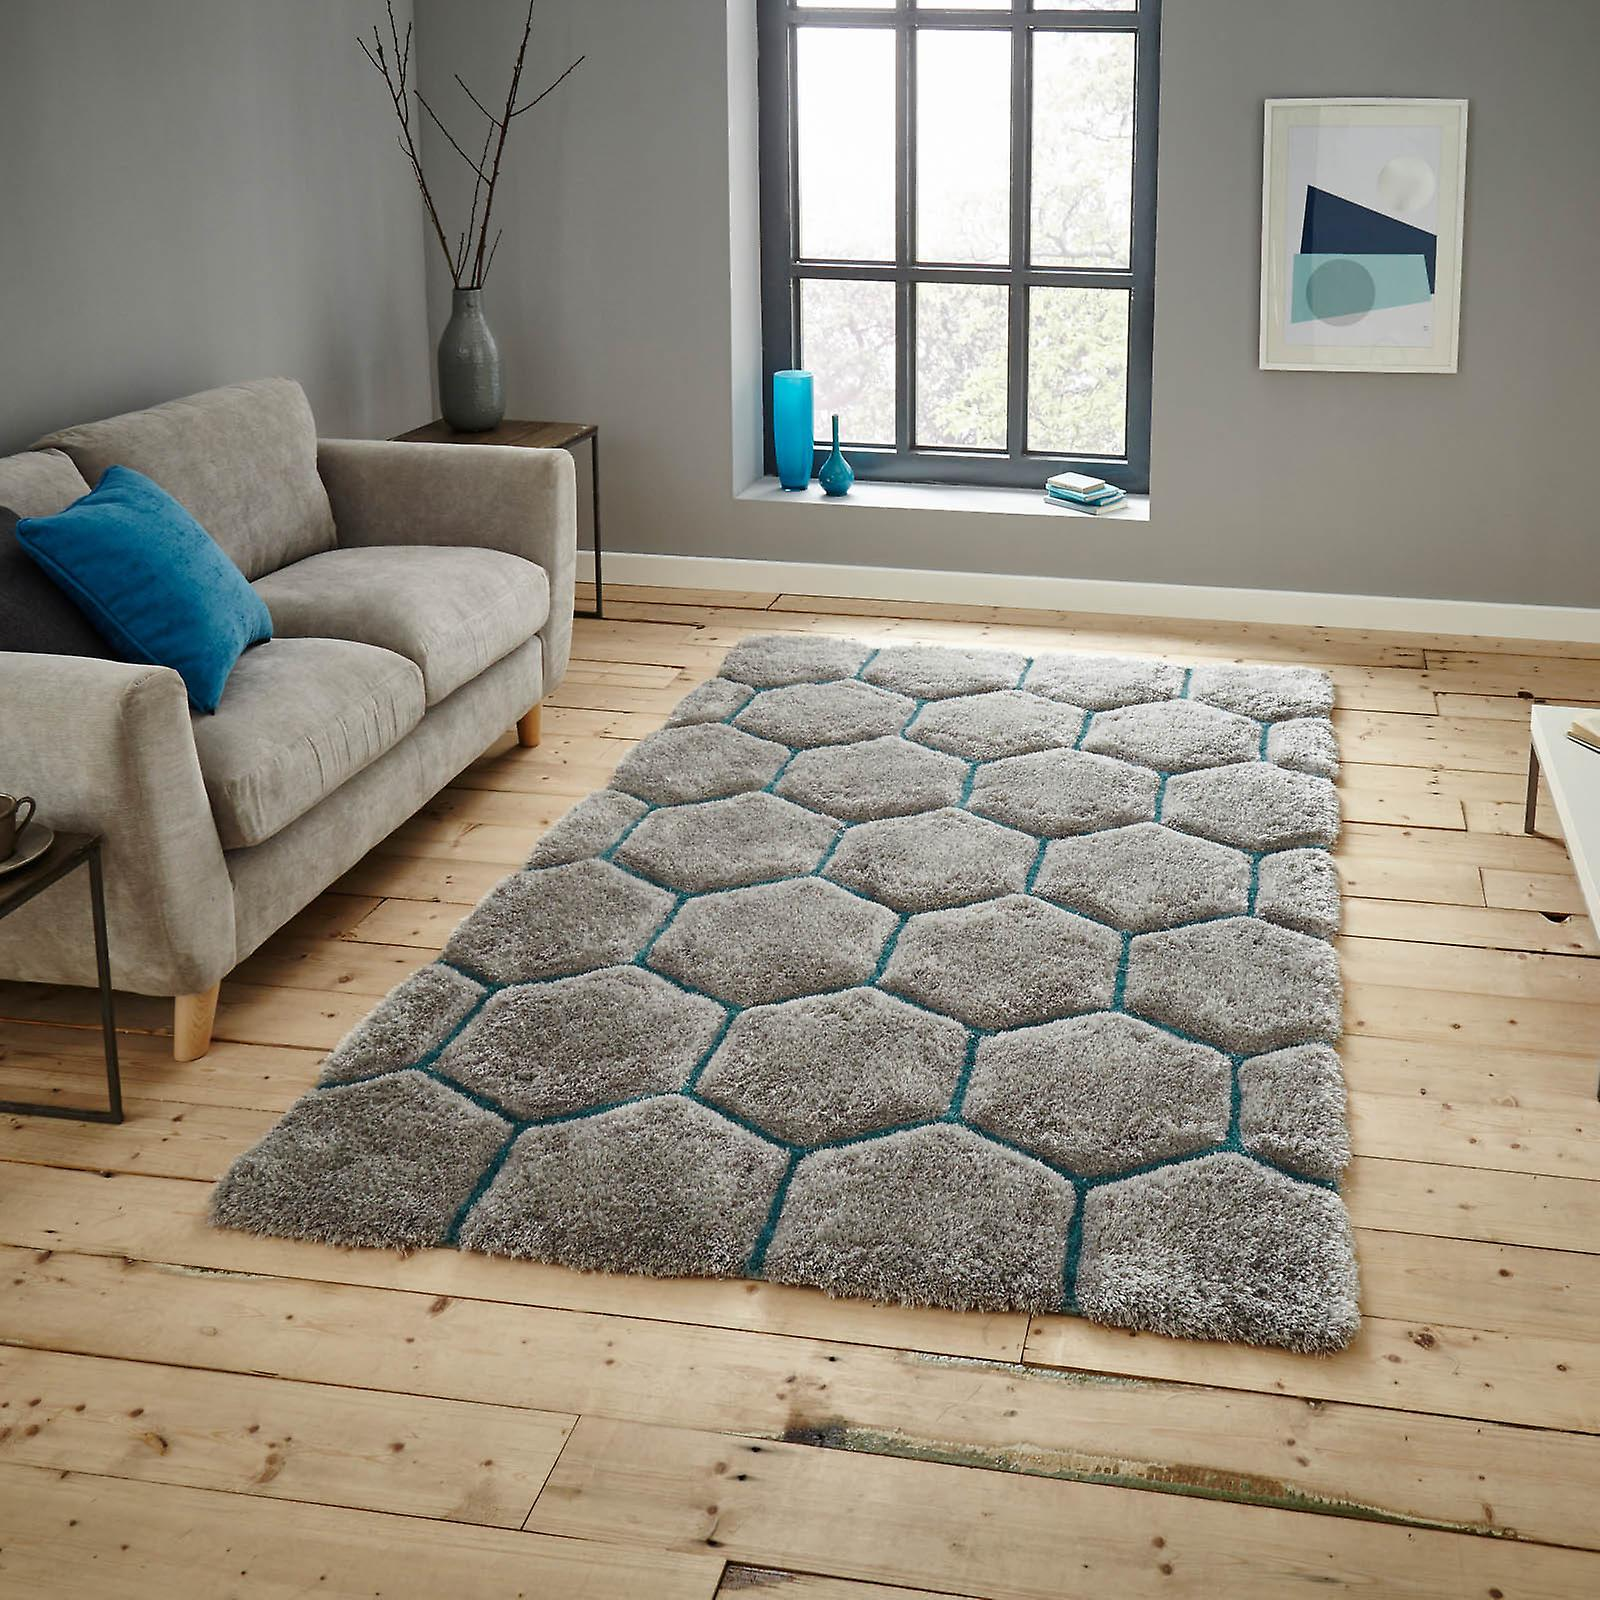 Nh30782 tapis maison noble en bleu gris